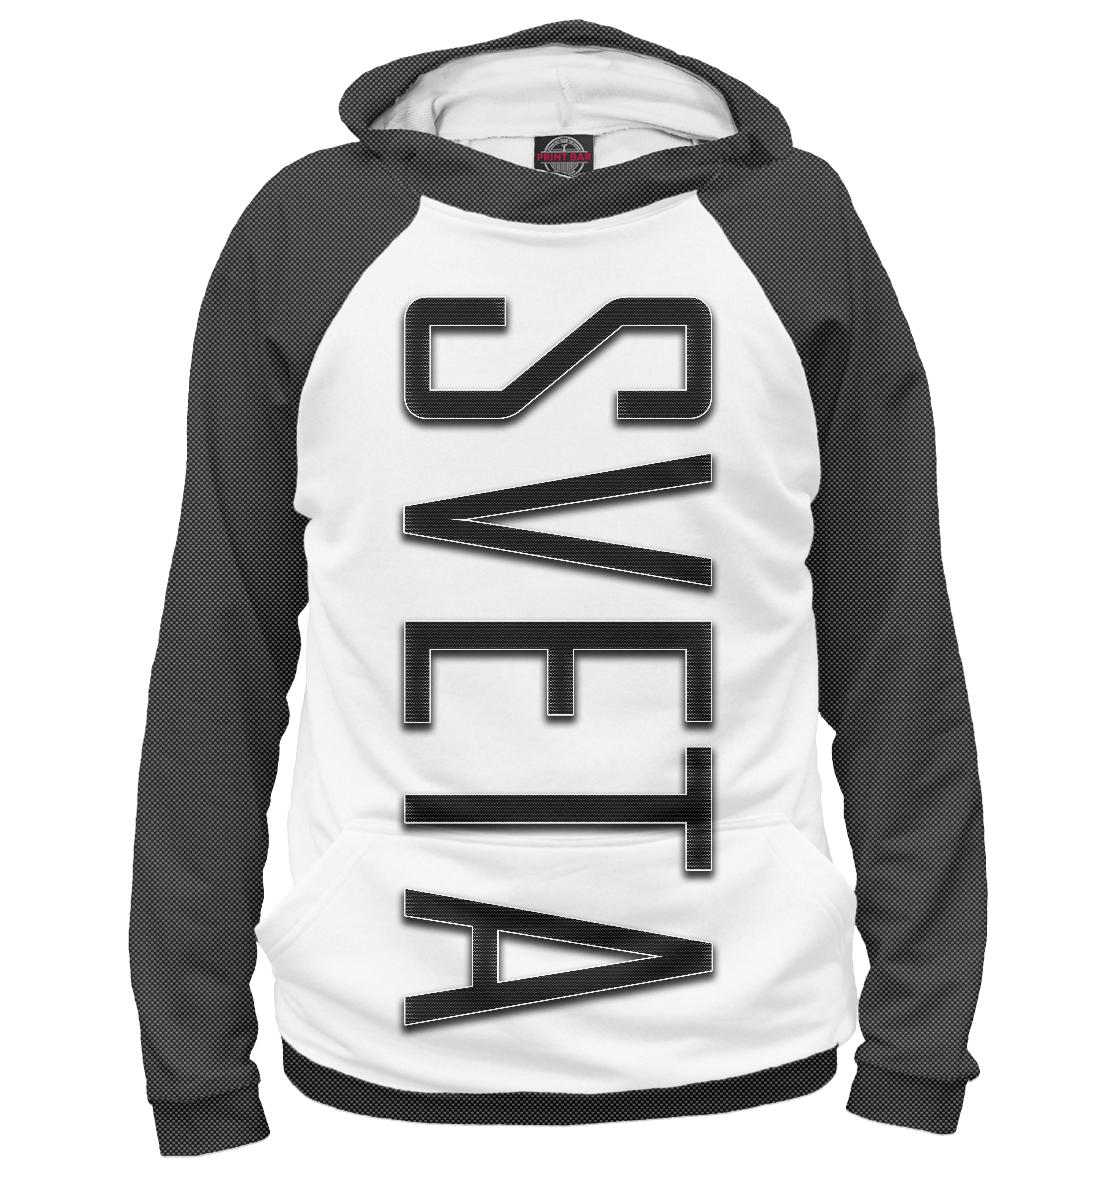 Купить Sveta-carbon, Printbar, Худи, IMR-689896-hud-2